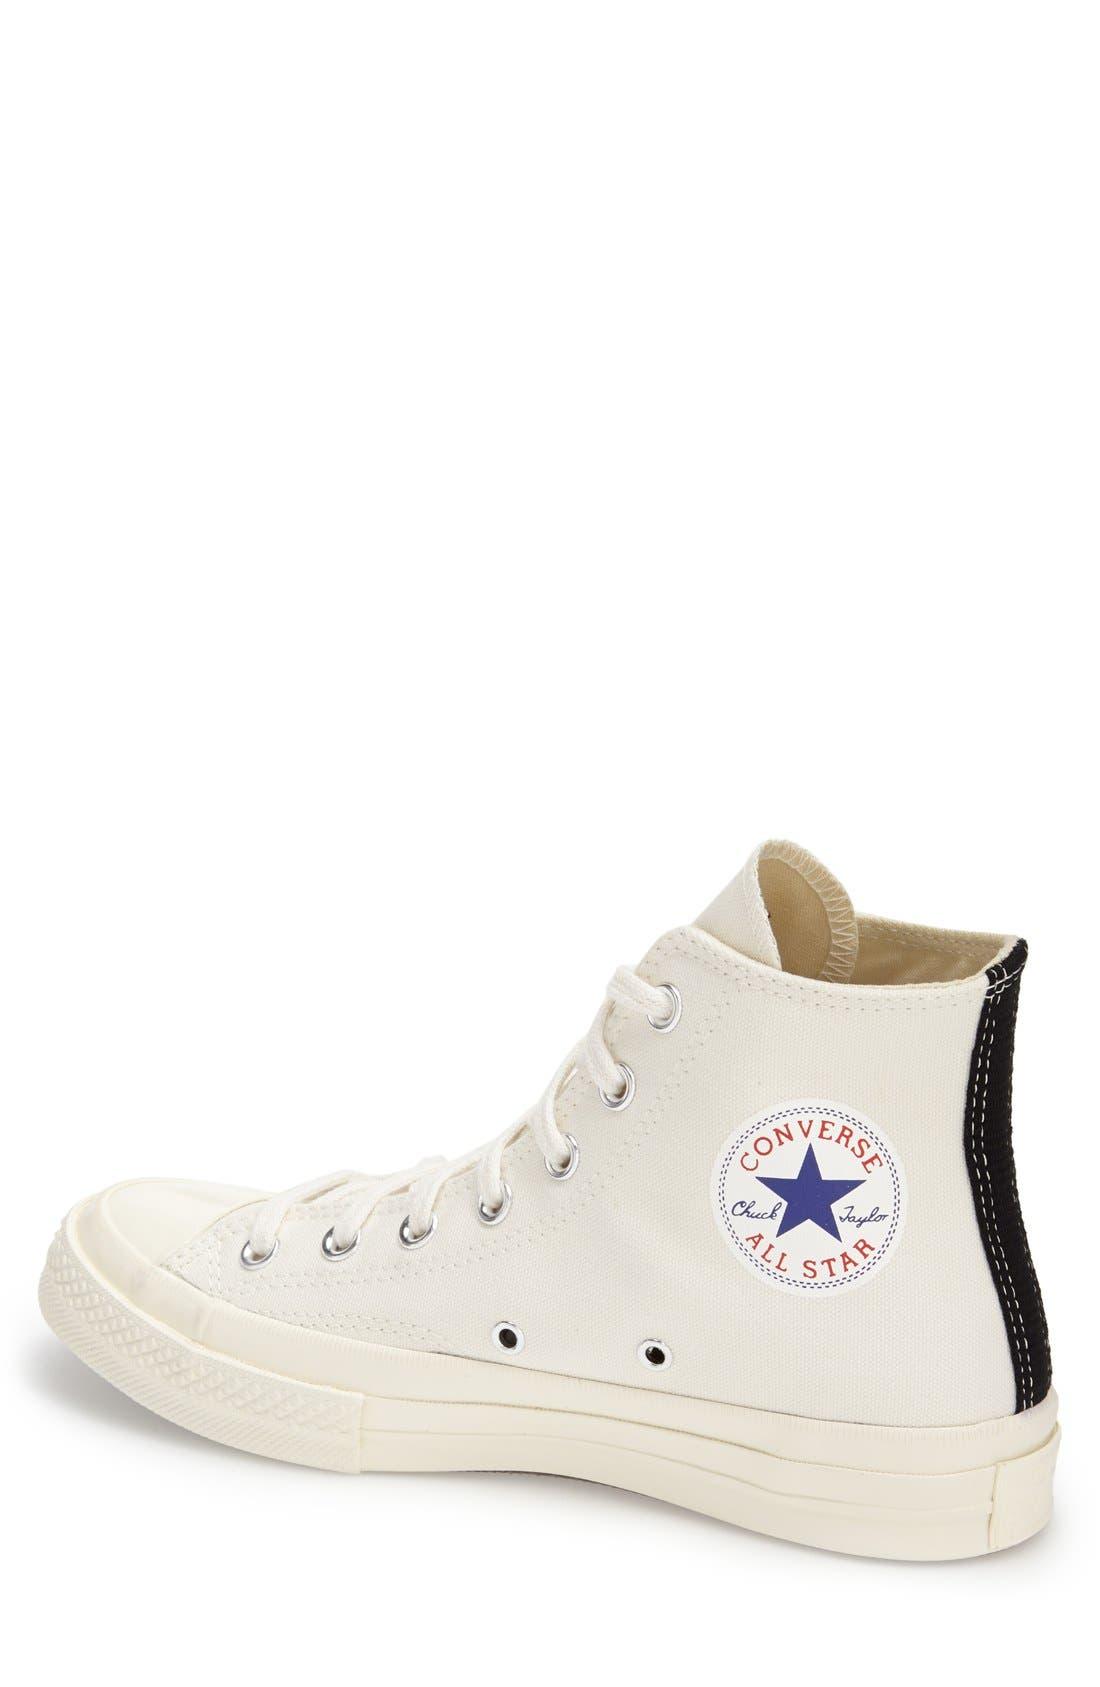 Comme des Garçons PLAYx Converse Chuck Taylor<sup>®</sup> - Hidden Heart High TopSneaker,                             Alternate thumbnail 2, color,                             White Canvas